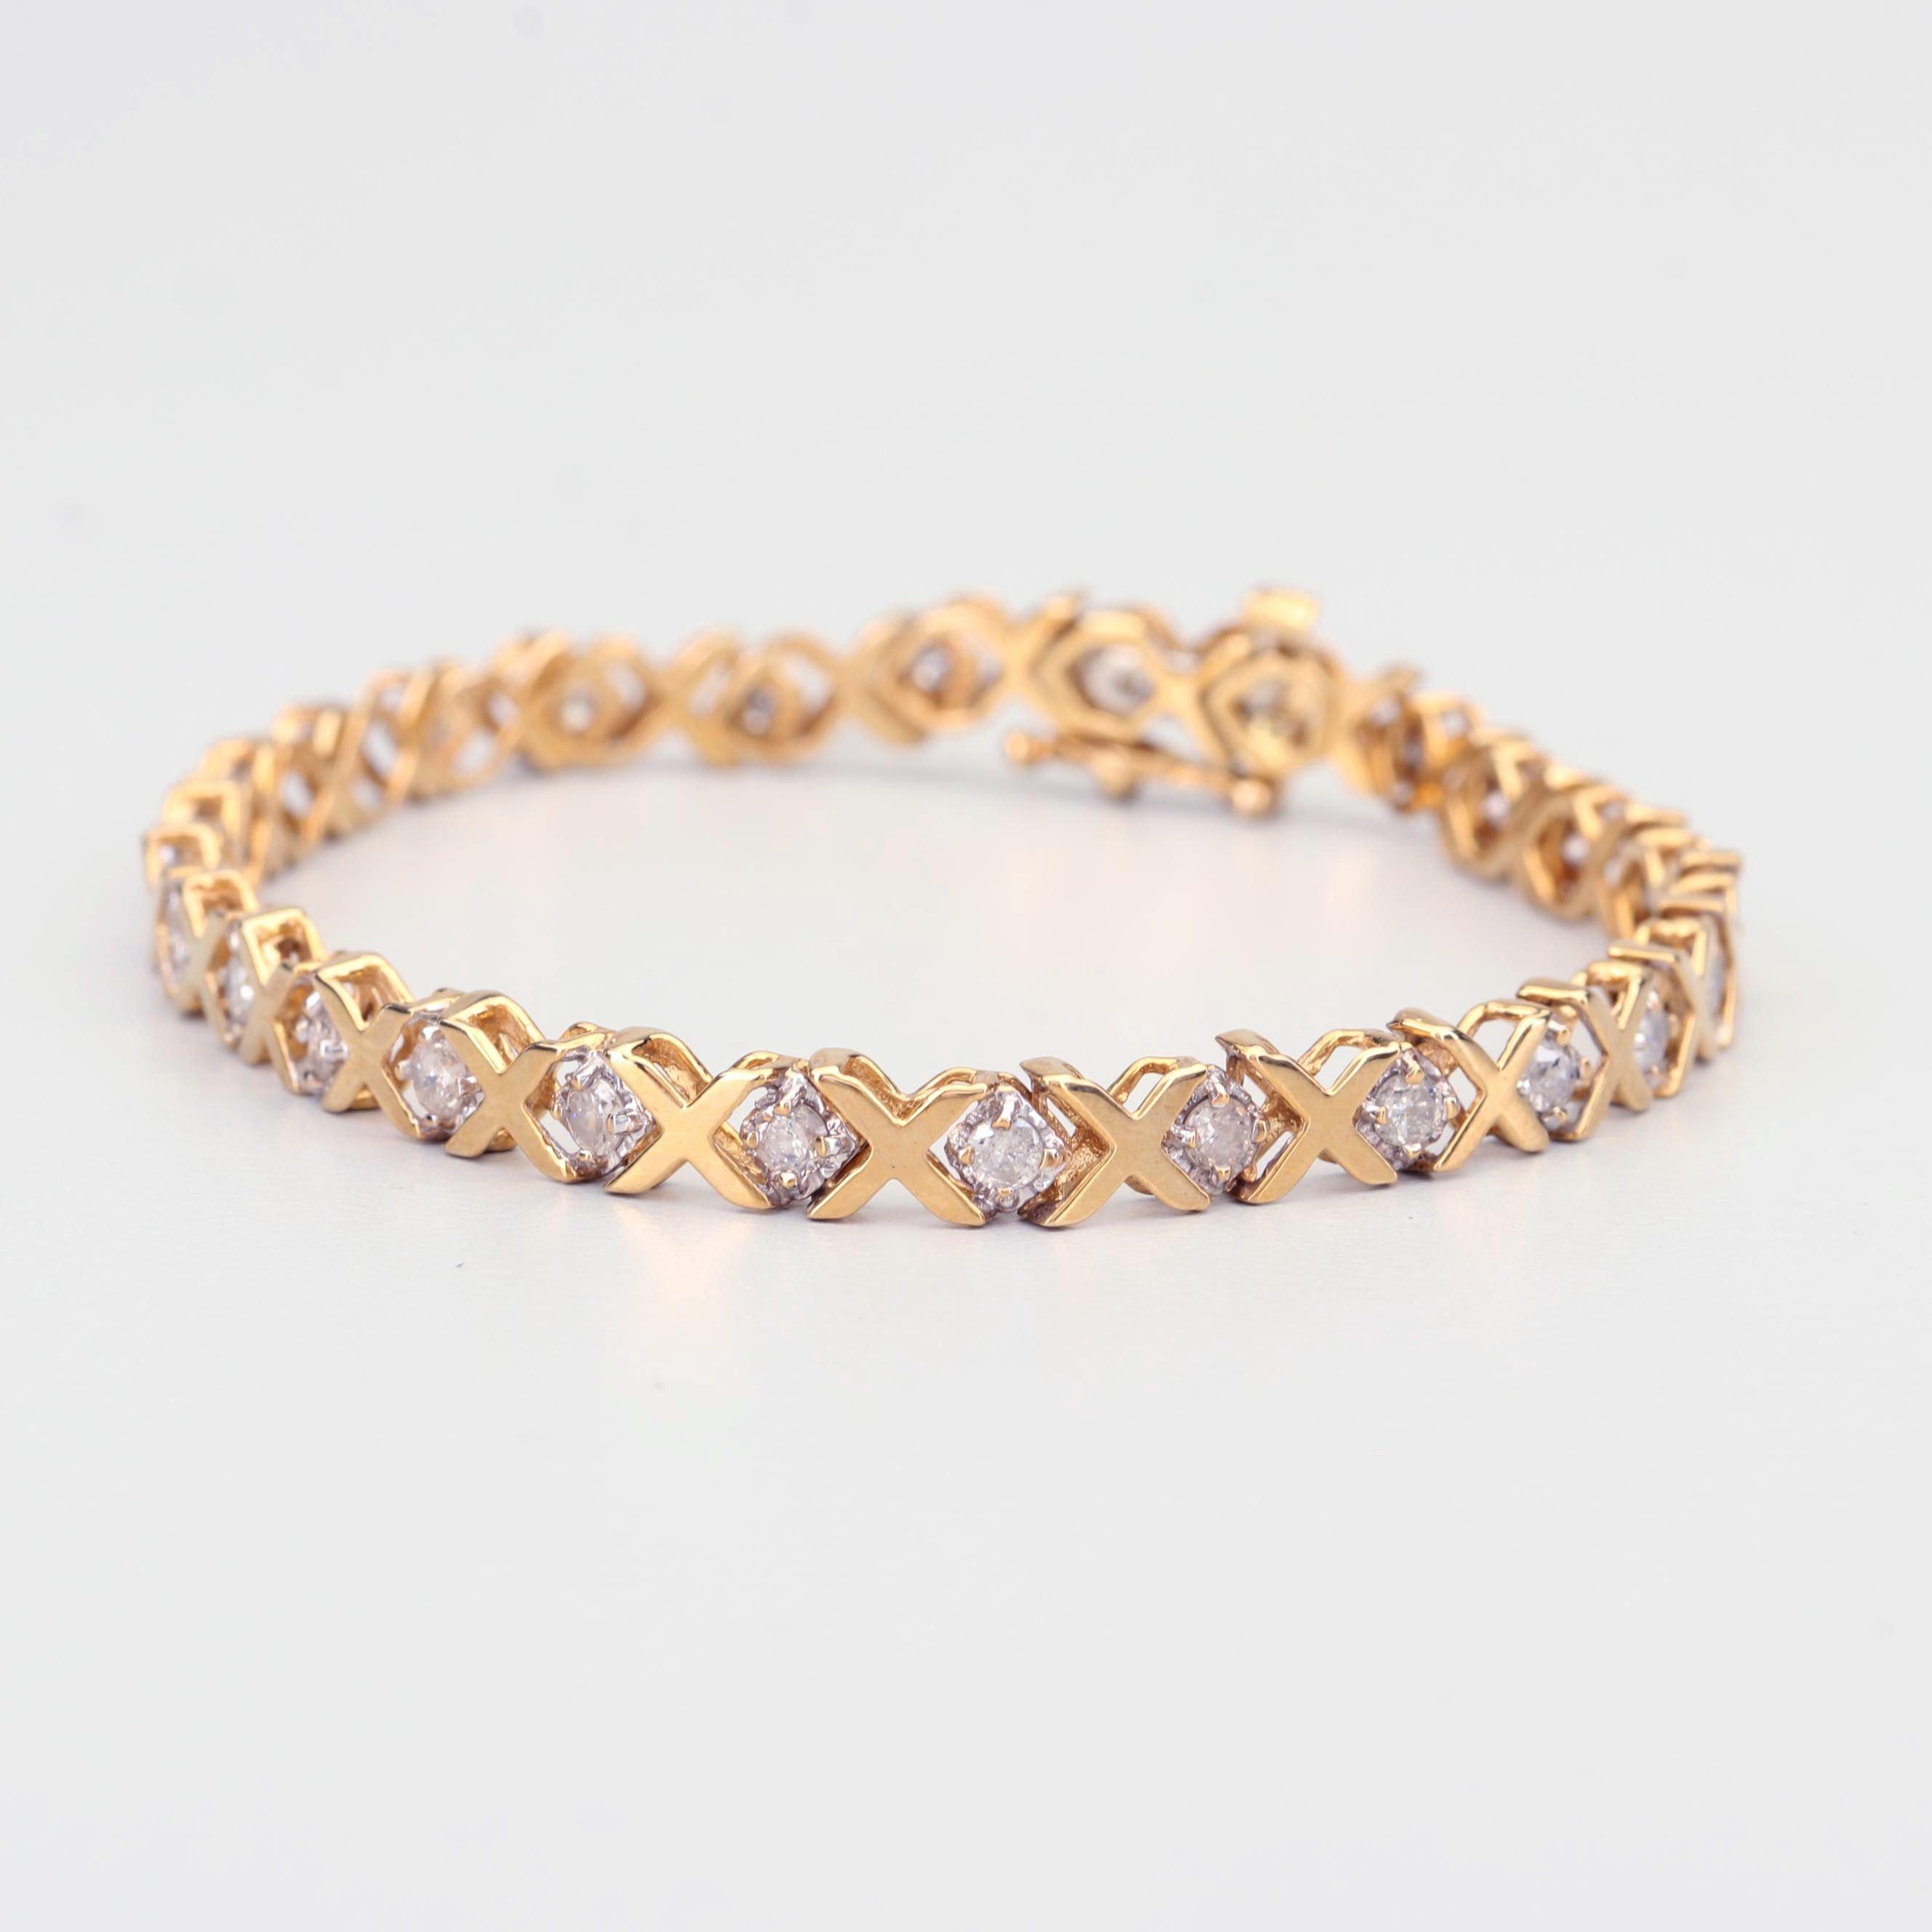 10K Yellow Gold 2.00 CTW Diamond Bracelet